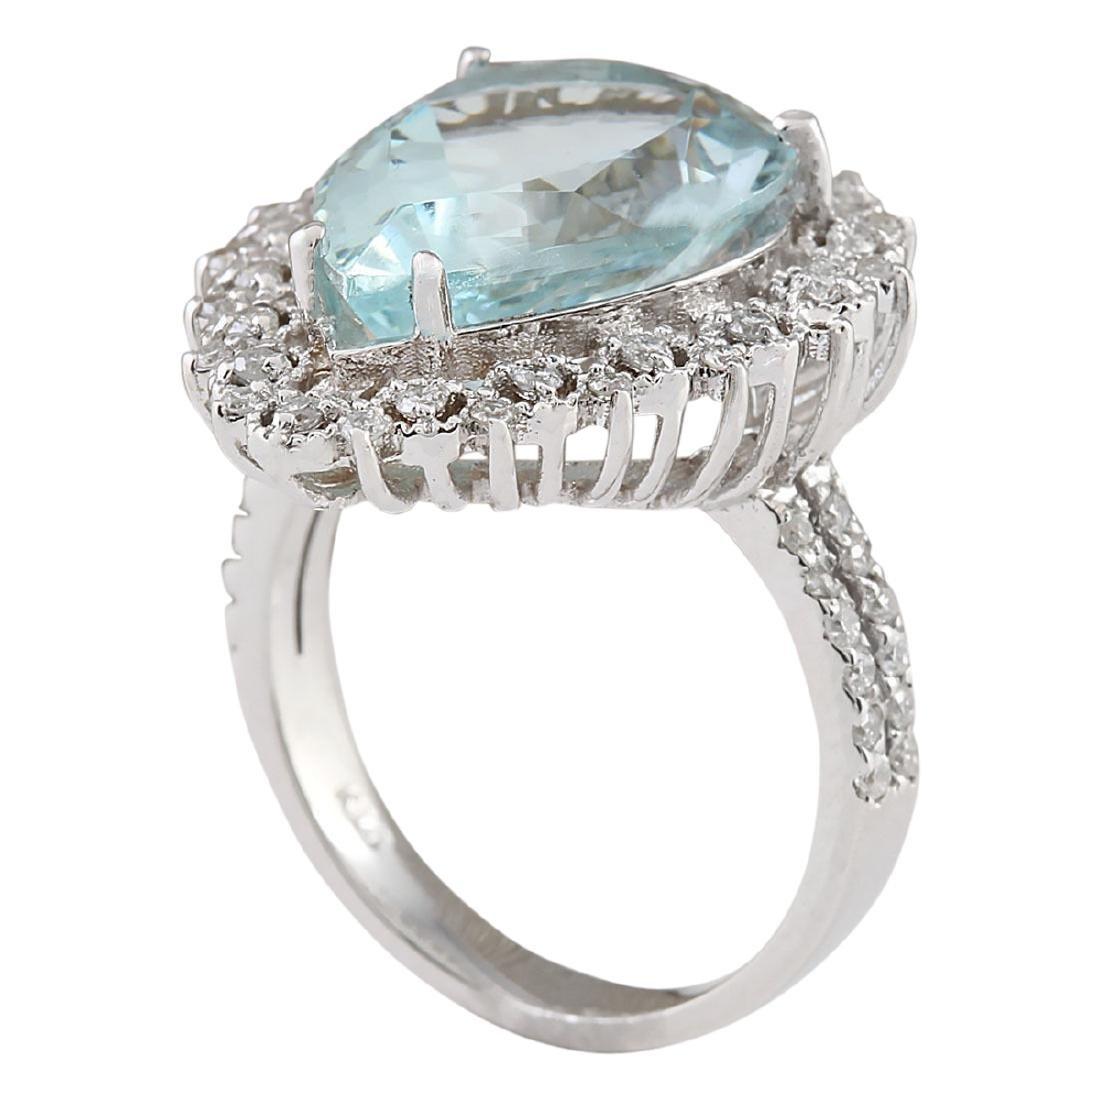 7.96 CTW Natural Aquamarine And Diamond Ring In 18K - 3